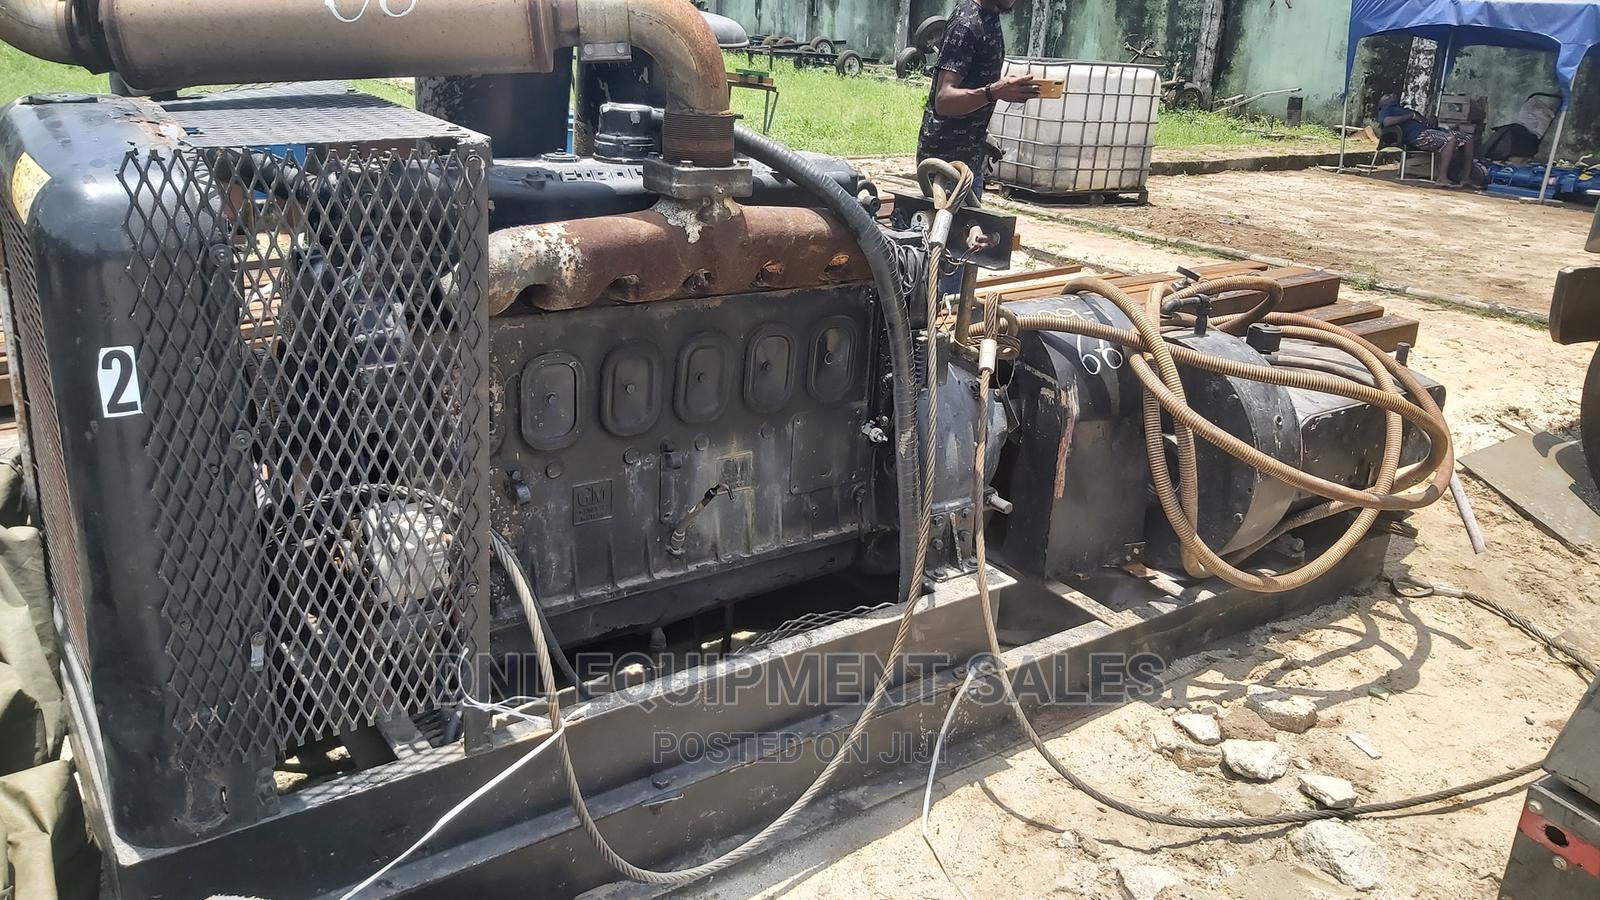 Hydro Test Pump With 671 Detroit Engine